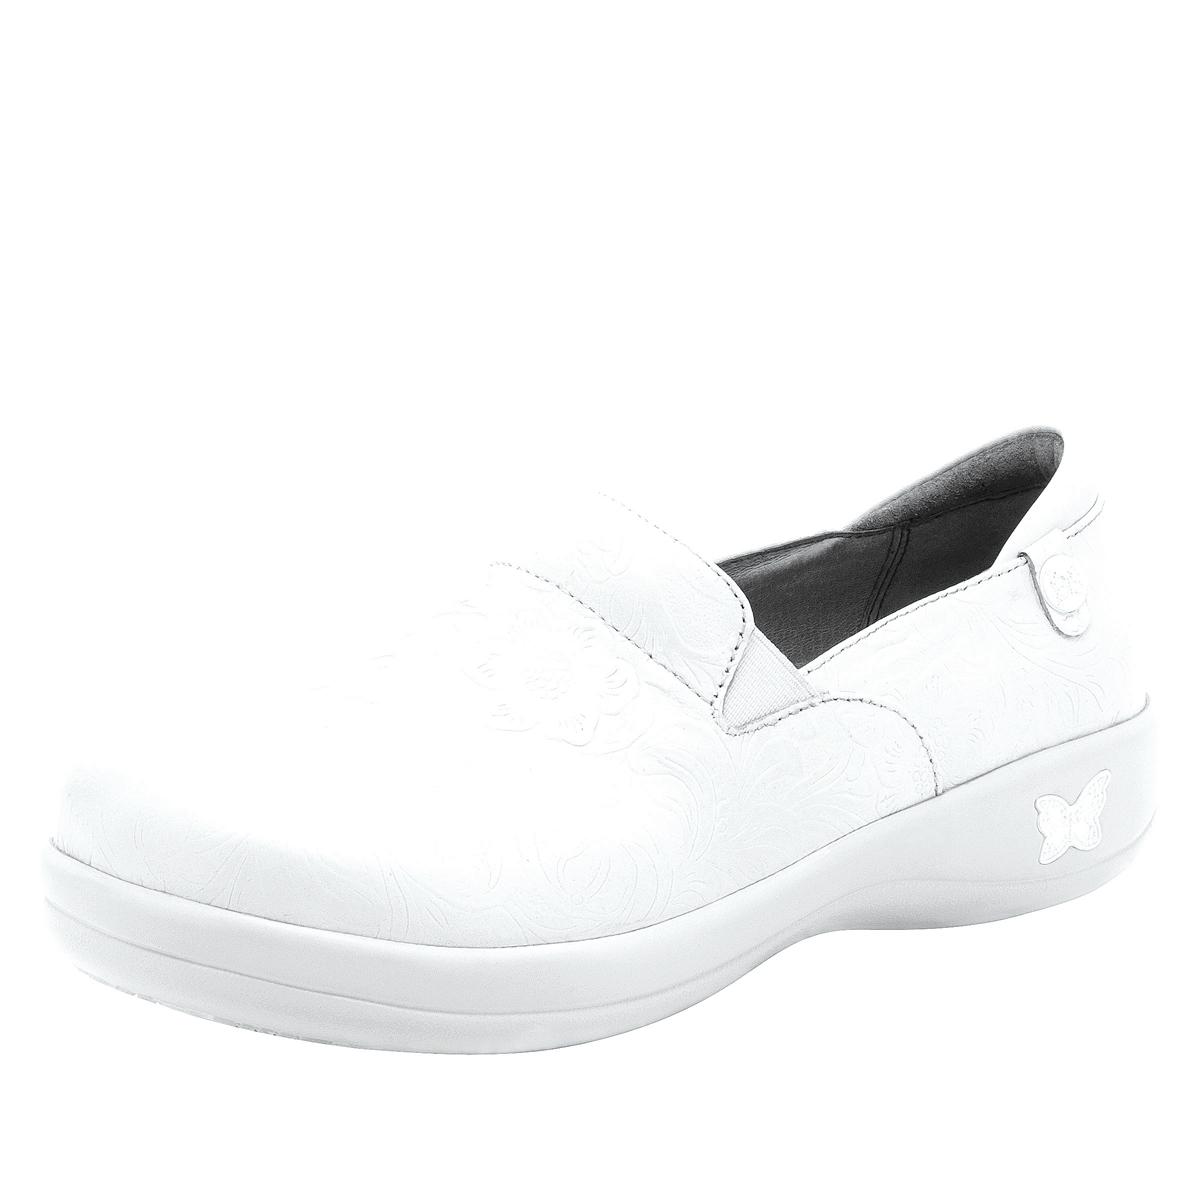 cd0d7970947b Nursing Shoes and Professional Footwear